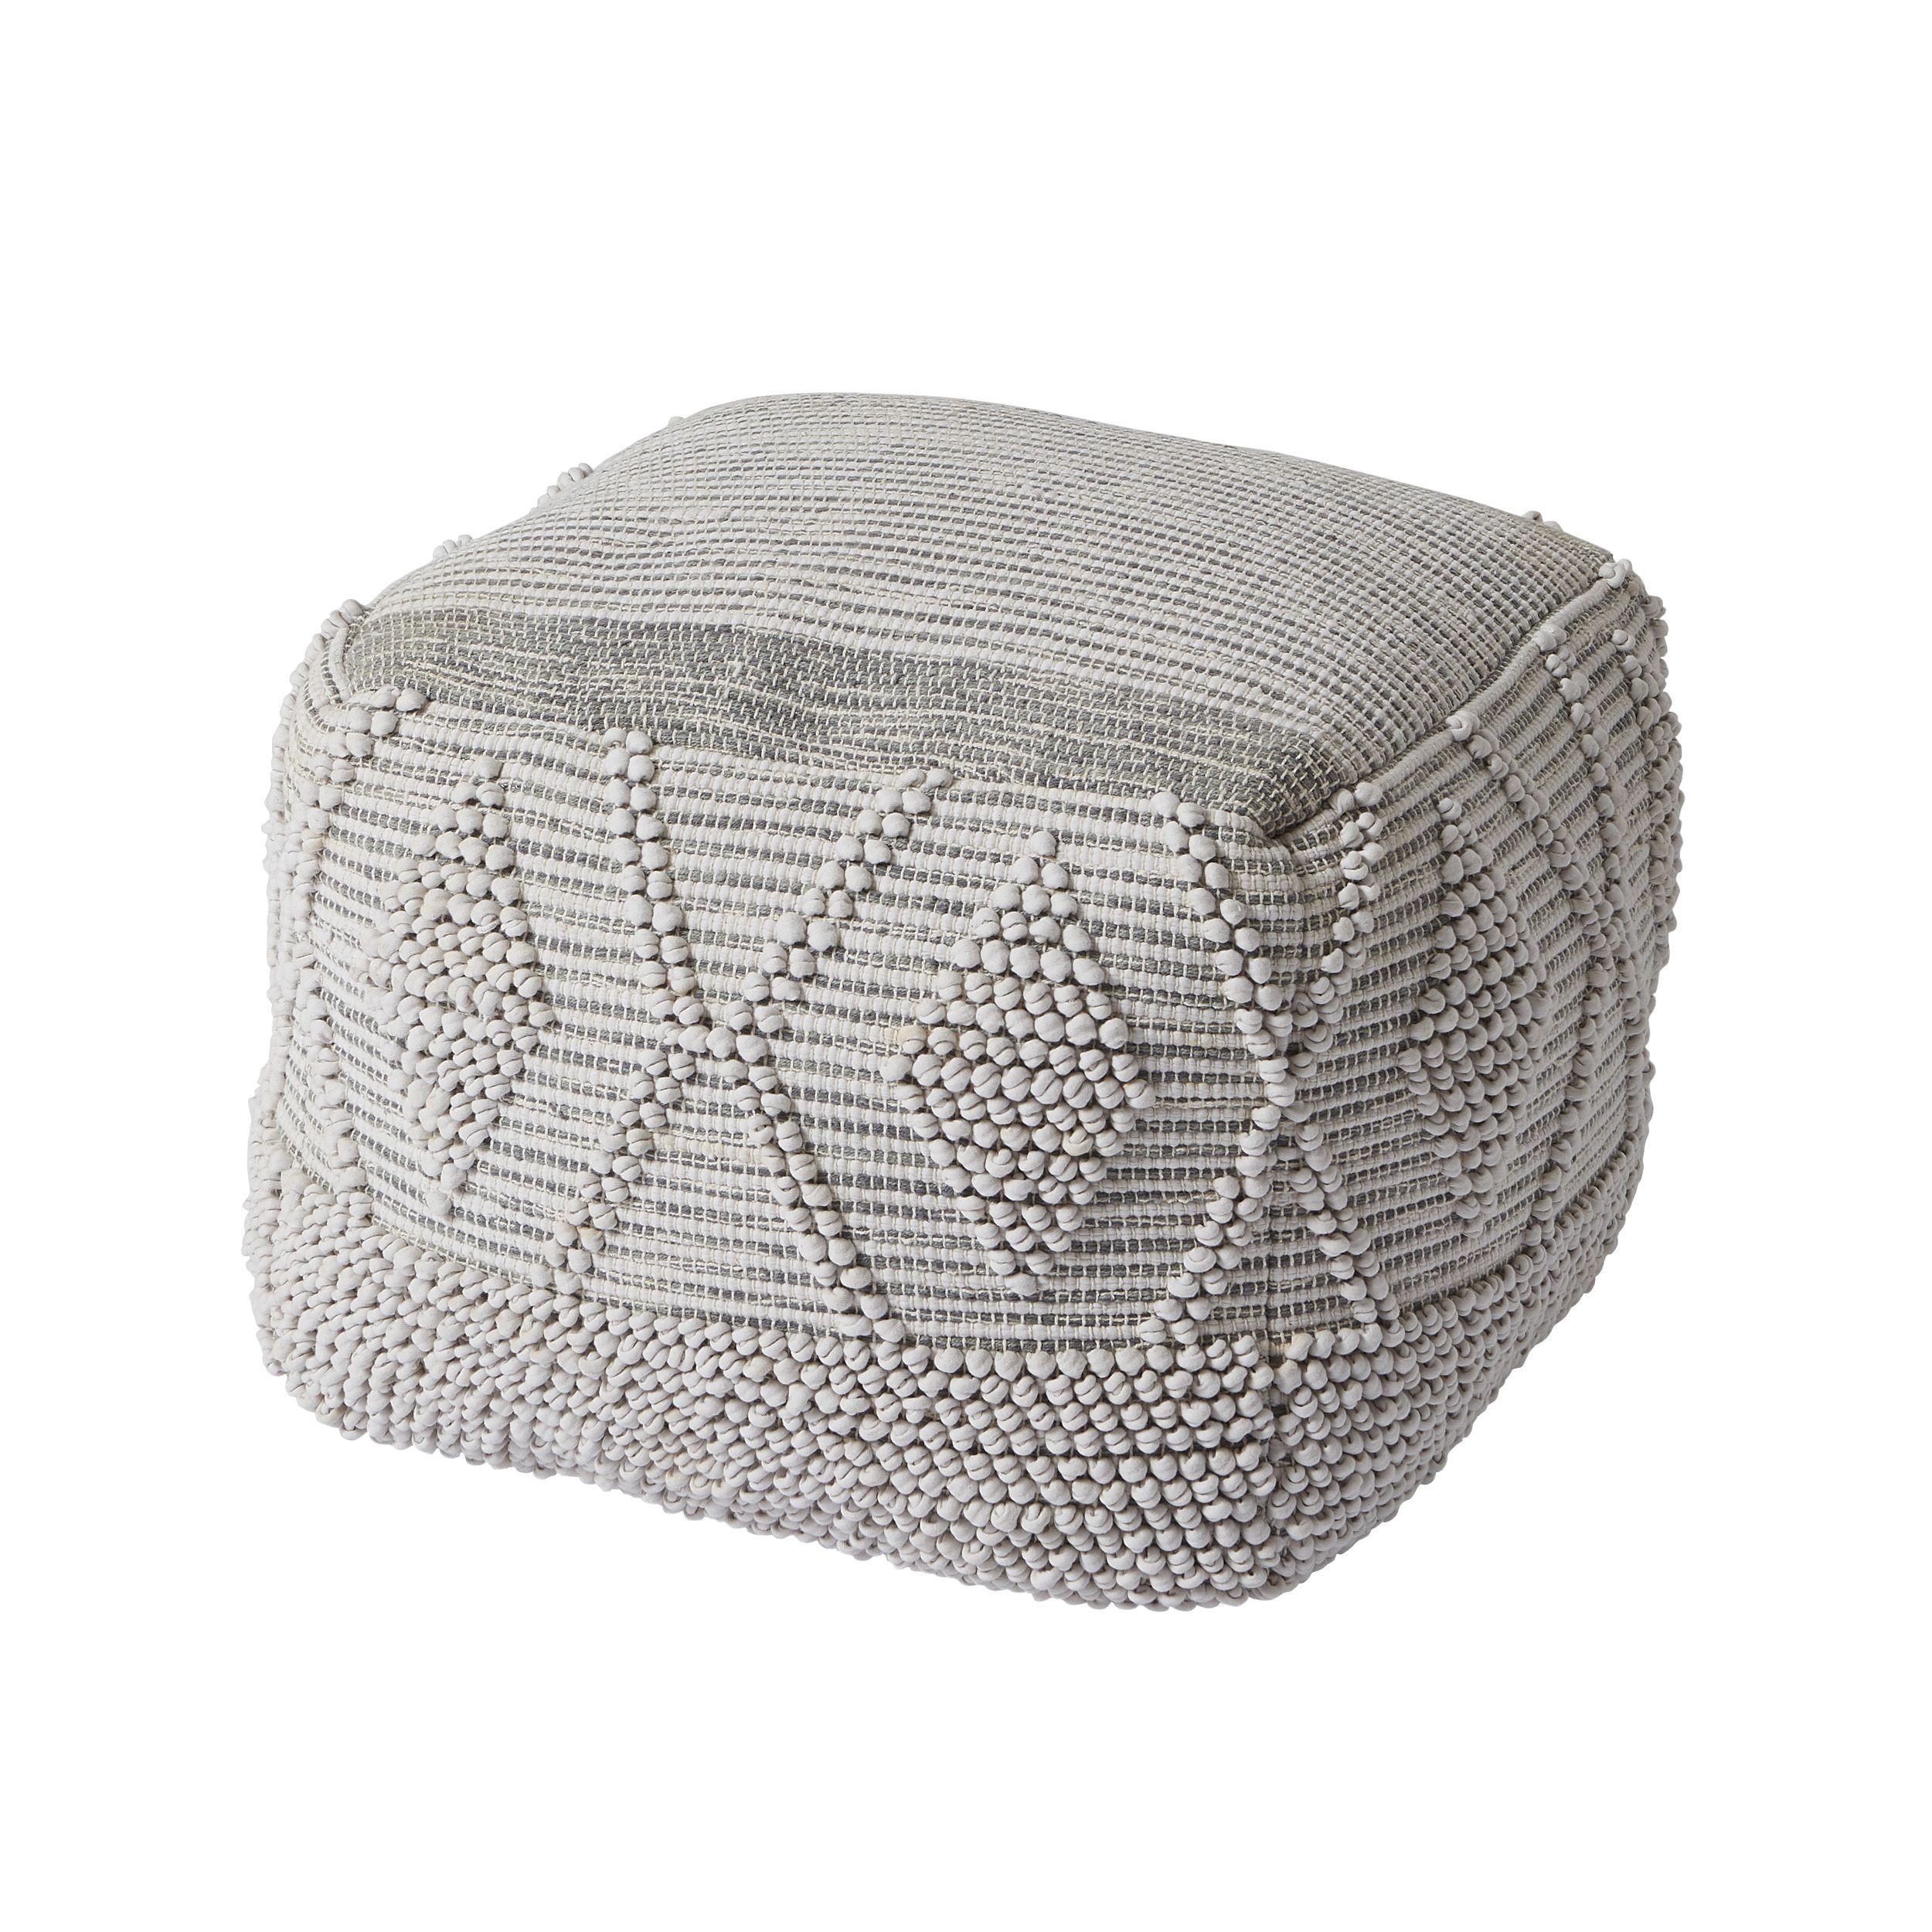 Magnificent Rural Crochet Stitch Grey Pouffe Departments Diy At Bq Short Links Chair Design For Home Short Linksinfo